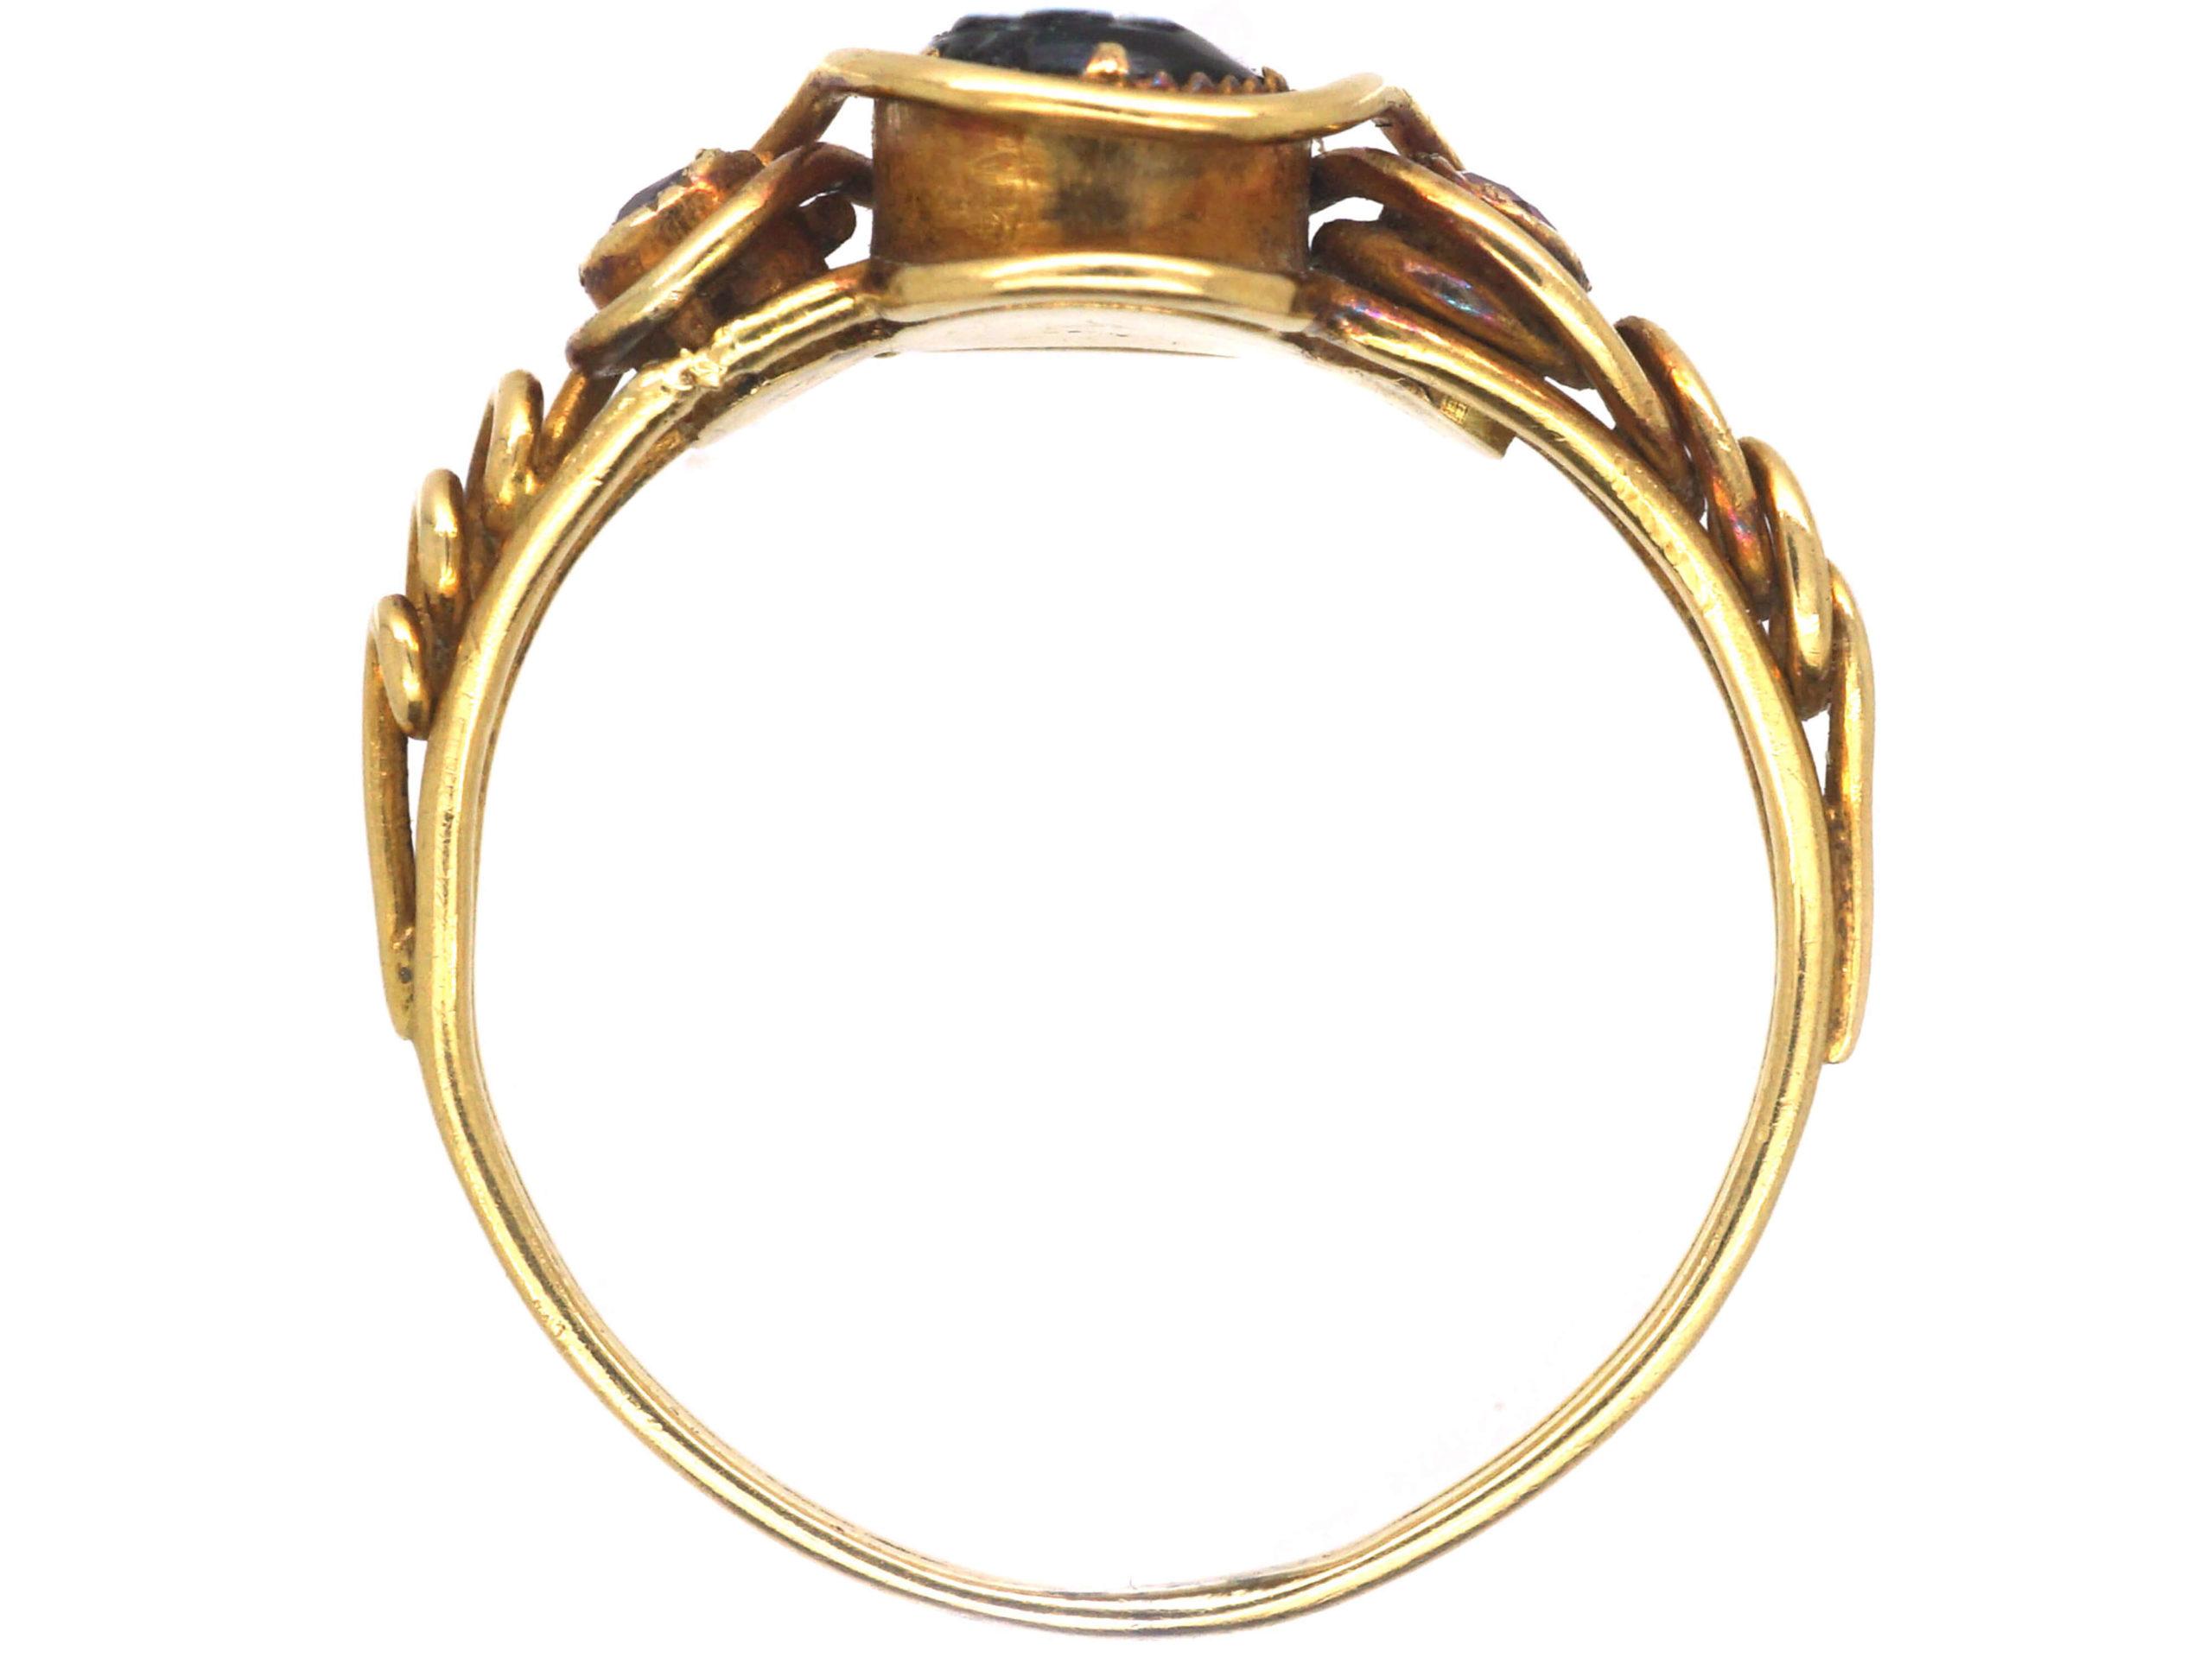 Early Victorian 15ct Gold, Ruby & Onyx Pense à Moi Ring